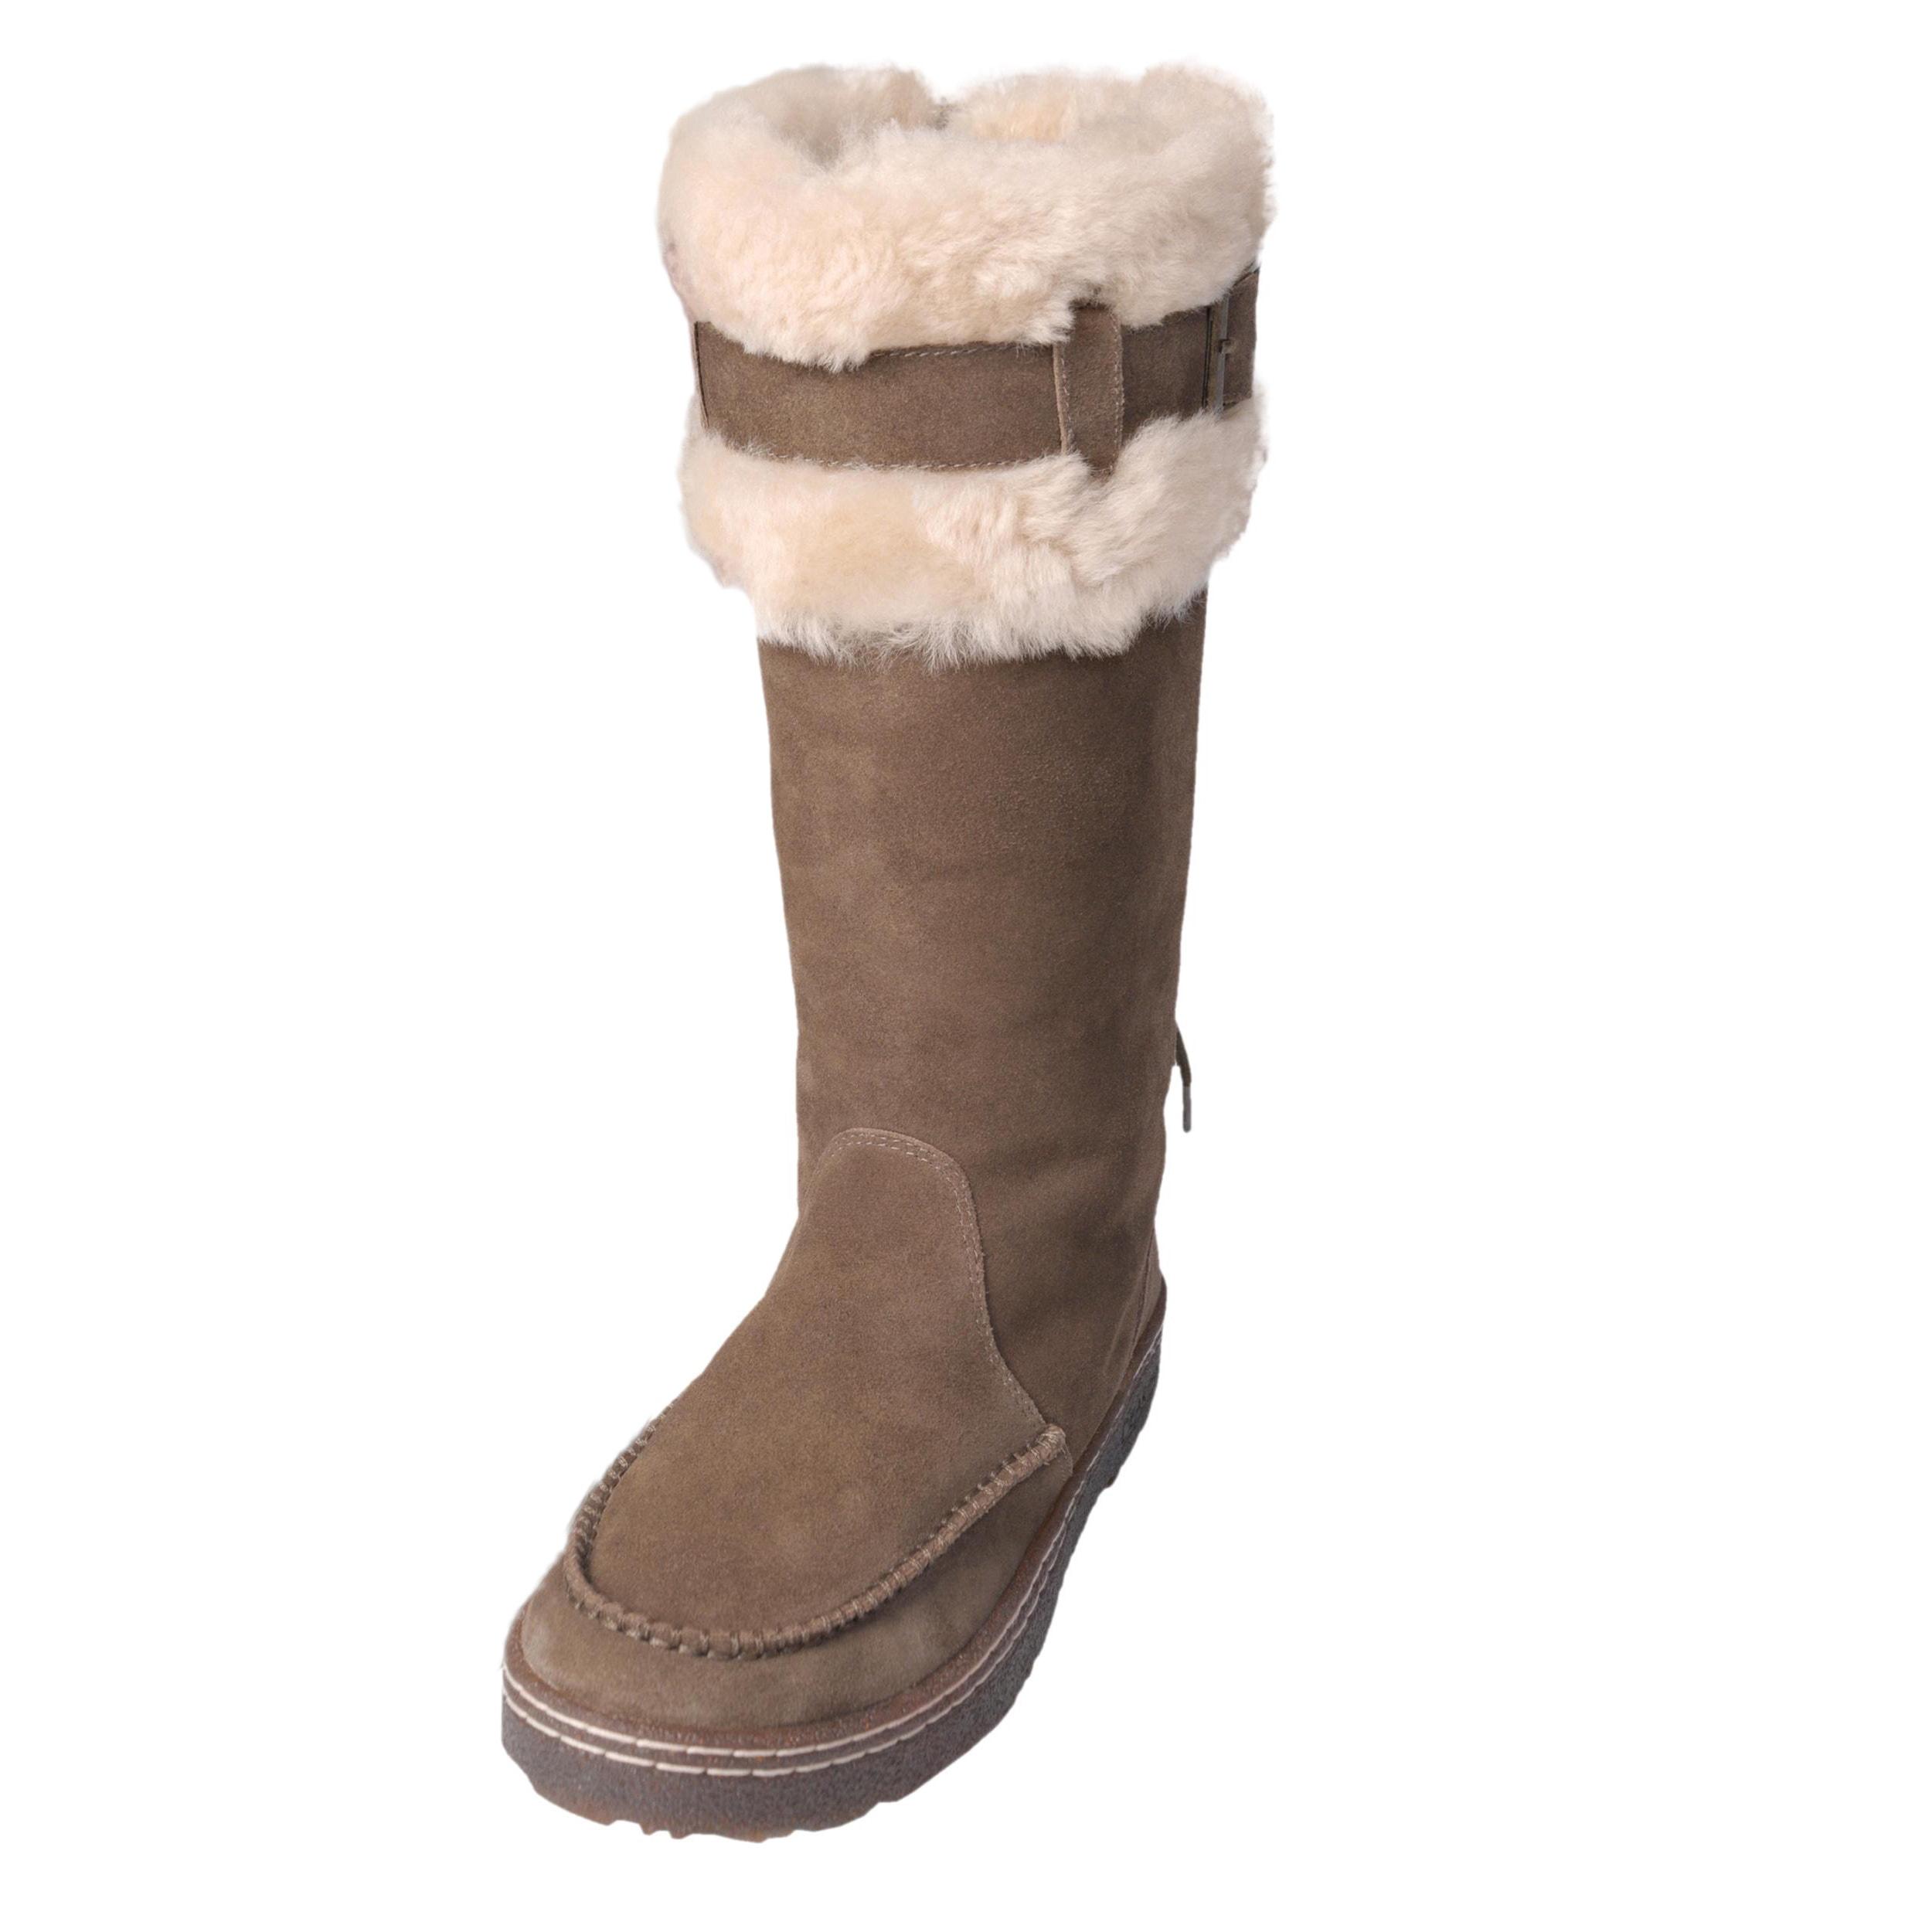 Bearpaw Women/'s Shearling Boots  Redwood Size 8